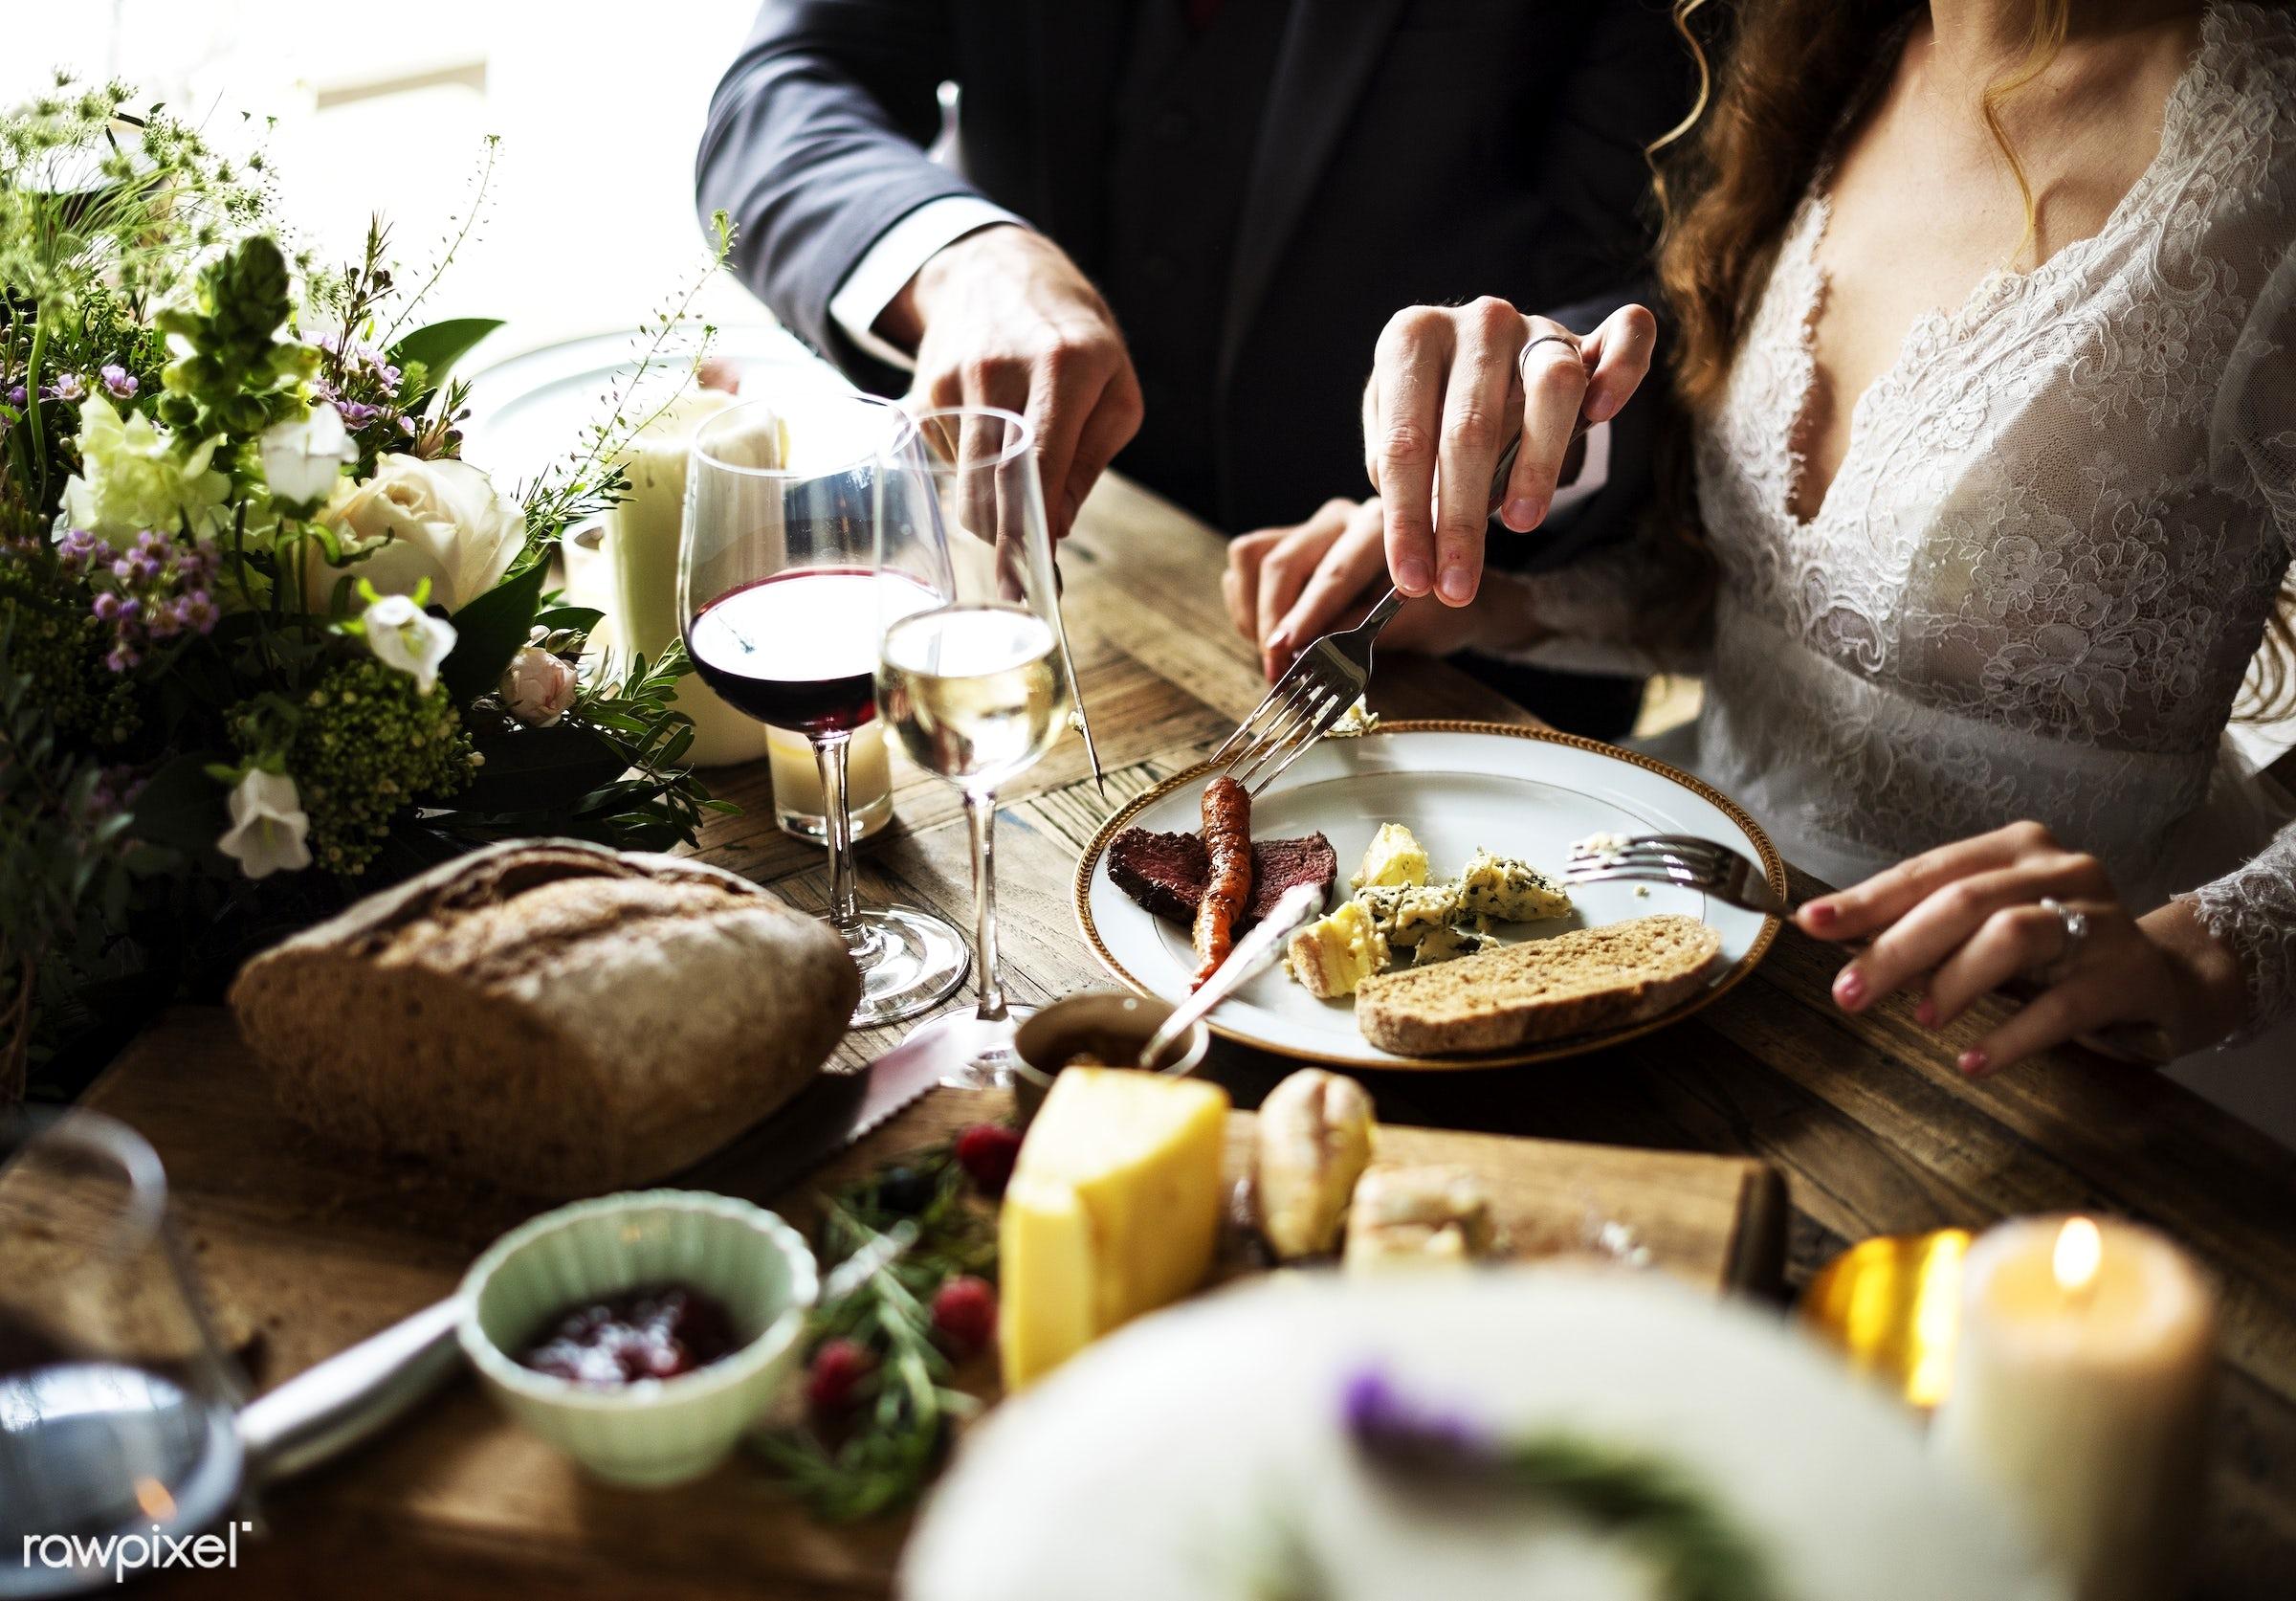 Bride and Groom Having Meal with Friends at Wedding Reception - wedding, adult, bridal, bride, celebrate, celebration,...